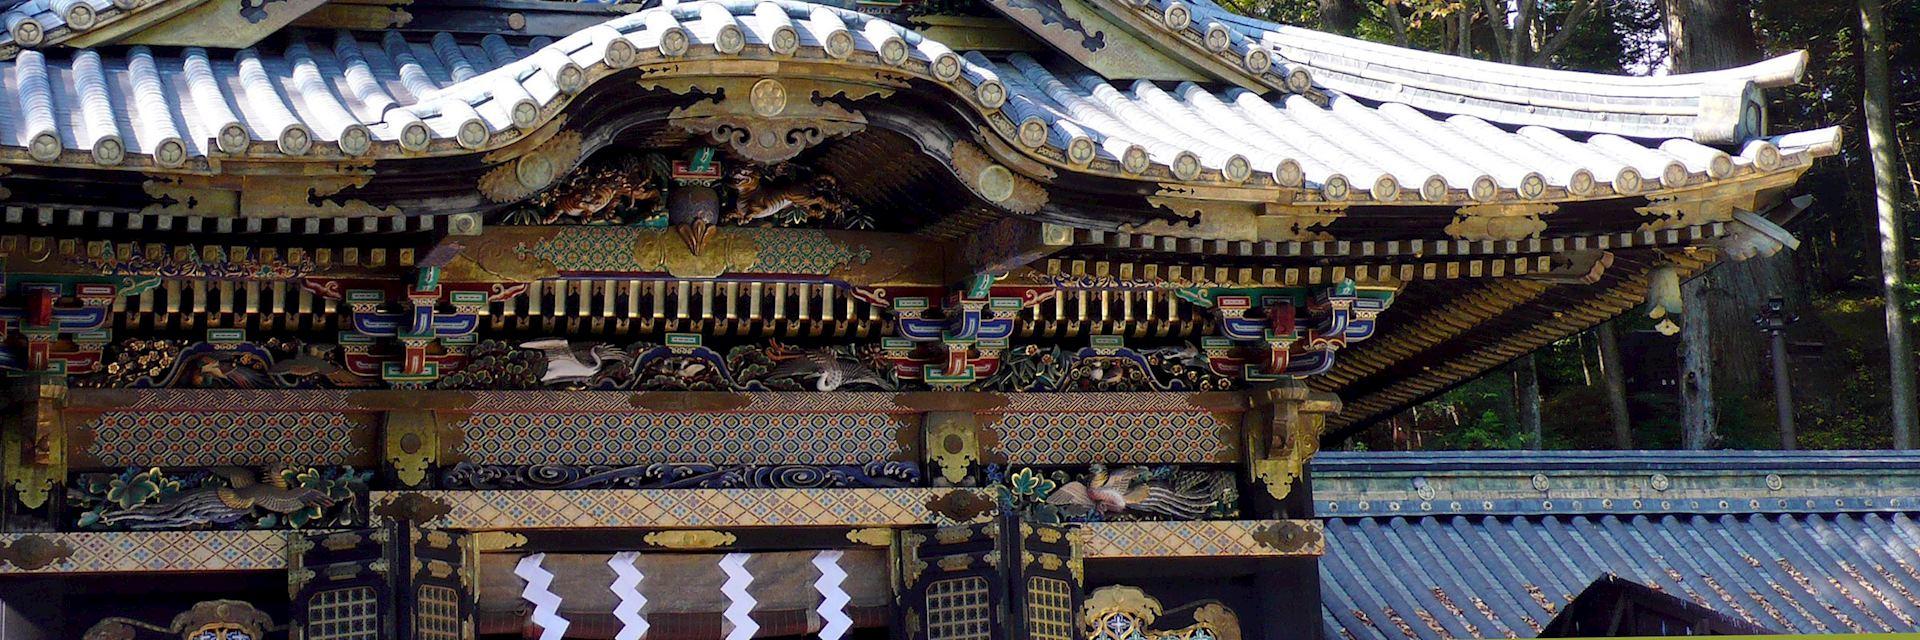 Toshogu Shrine, Nikko, Japan